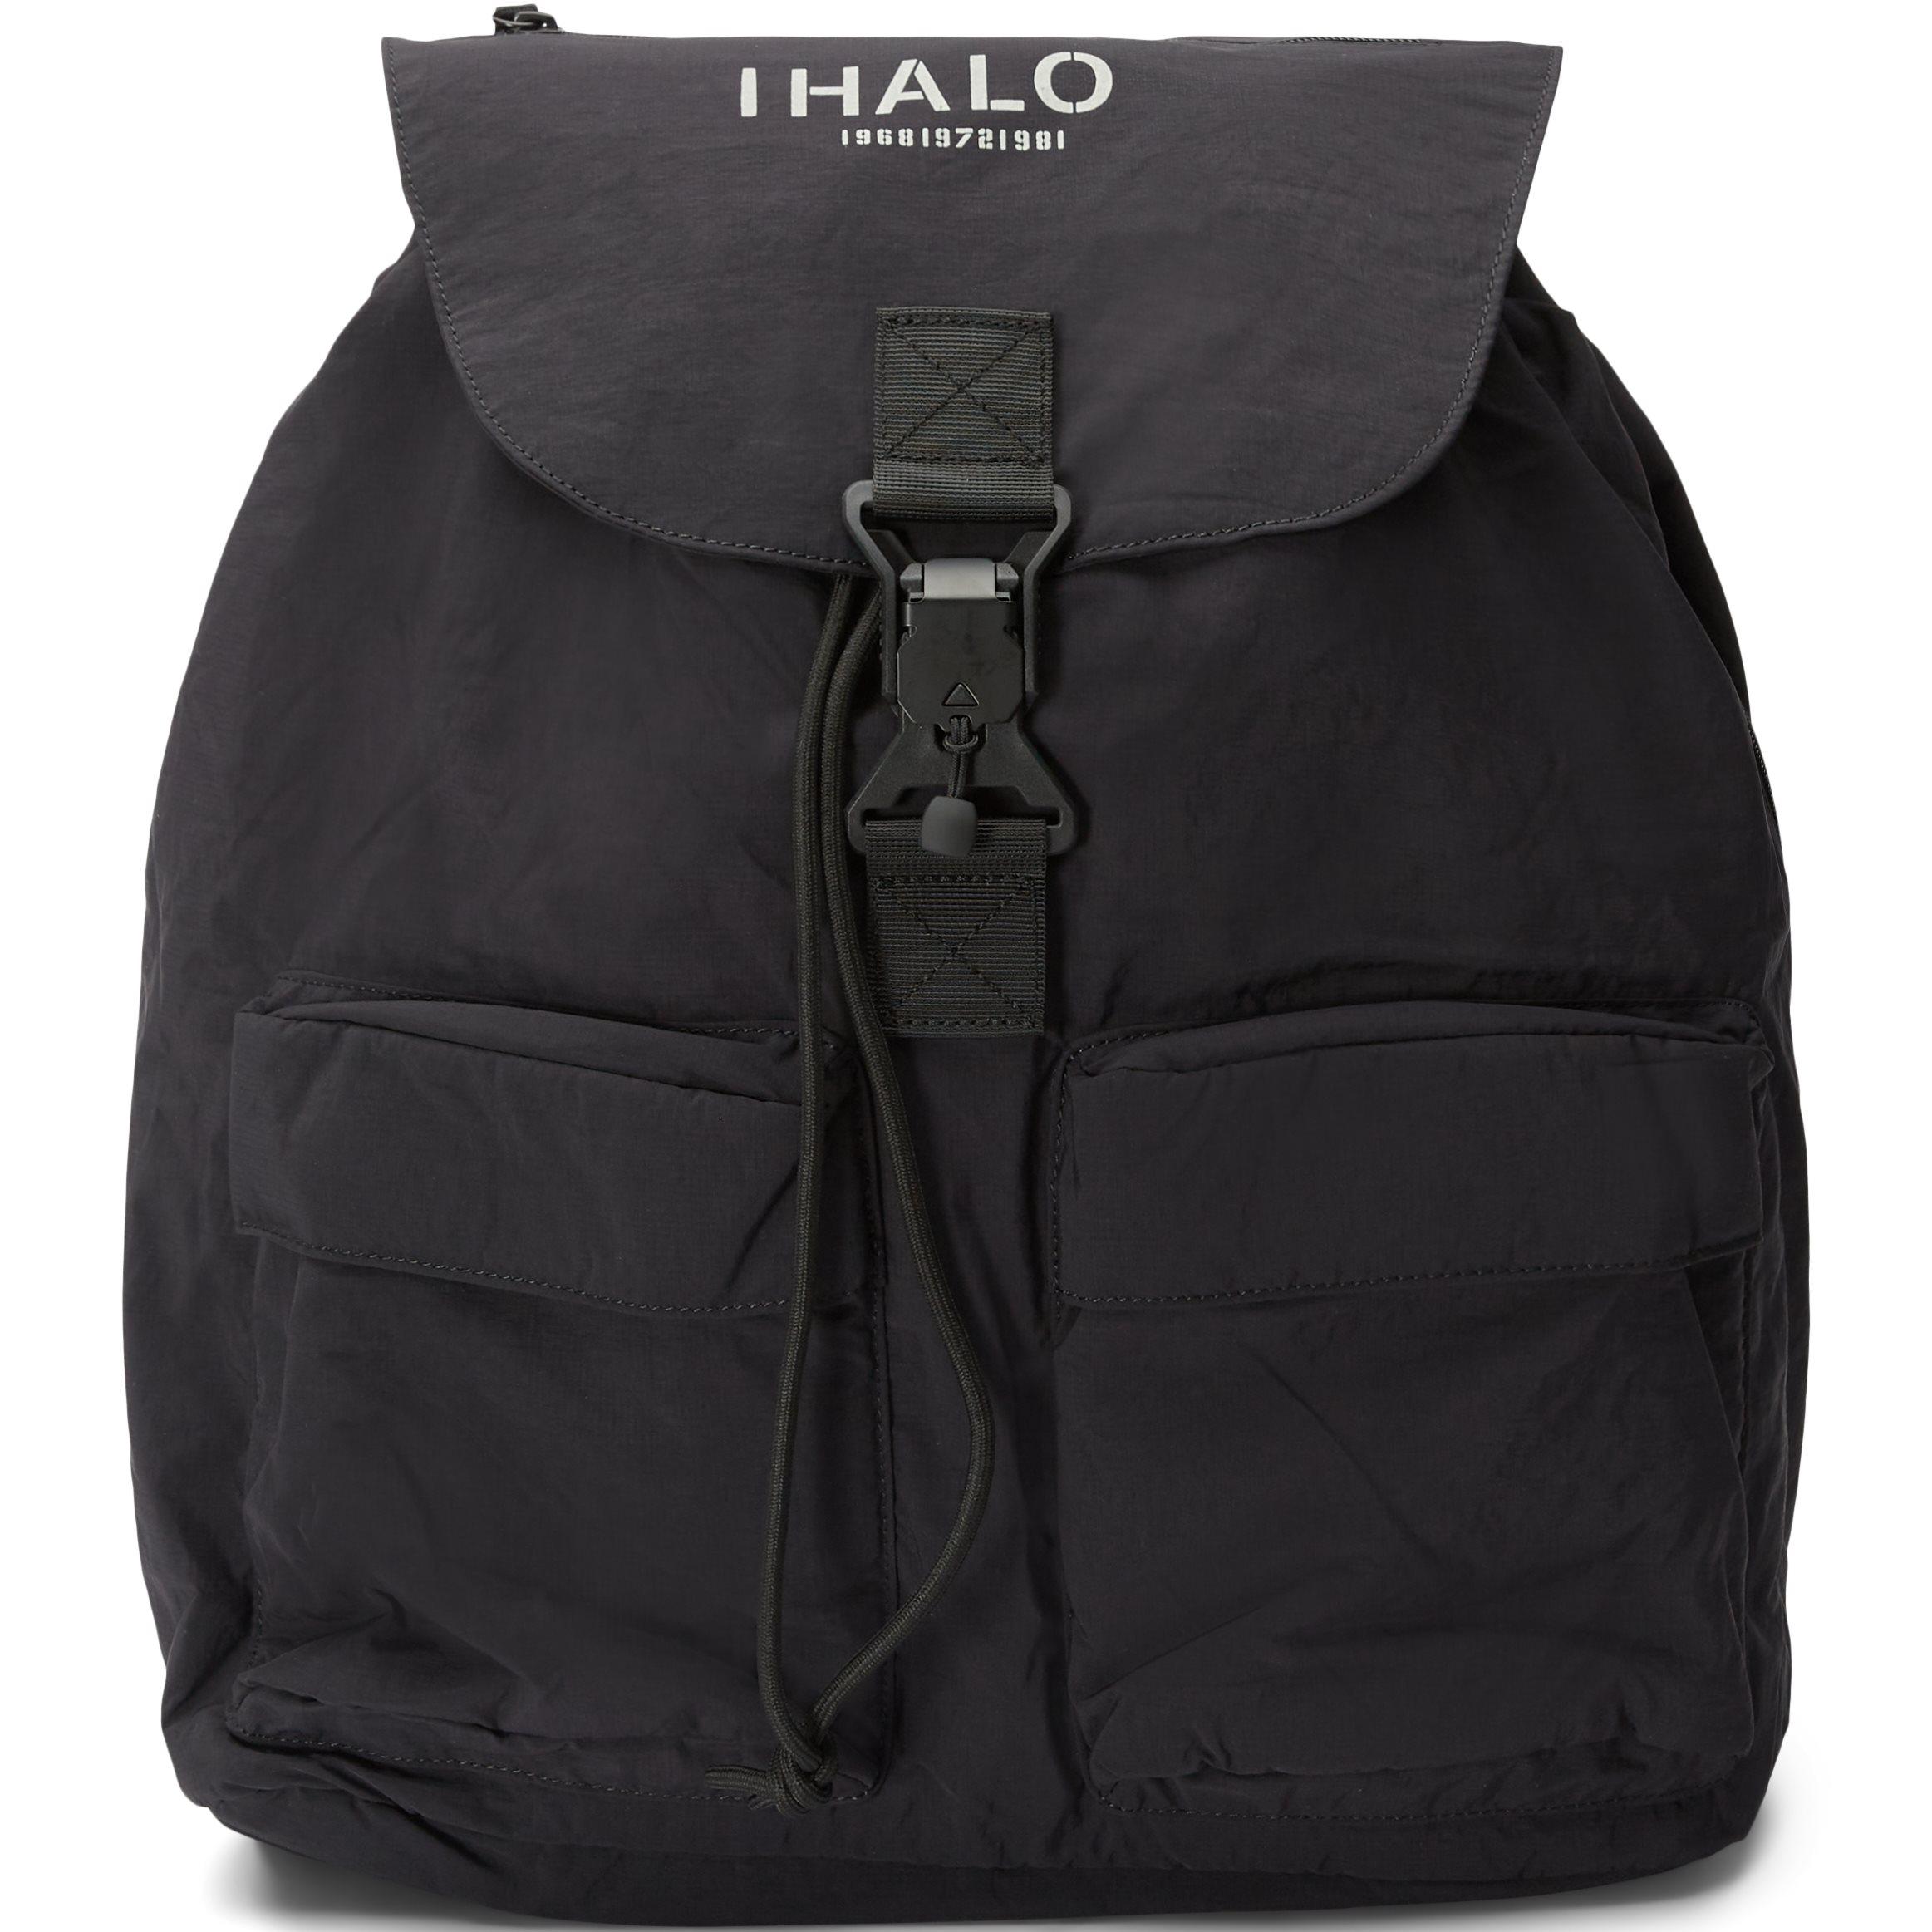 Nylon Backpack - Väskor - Svart